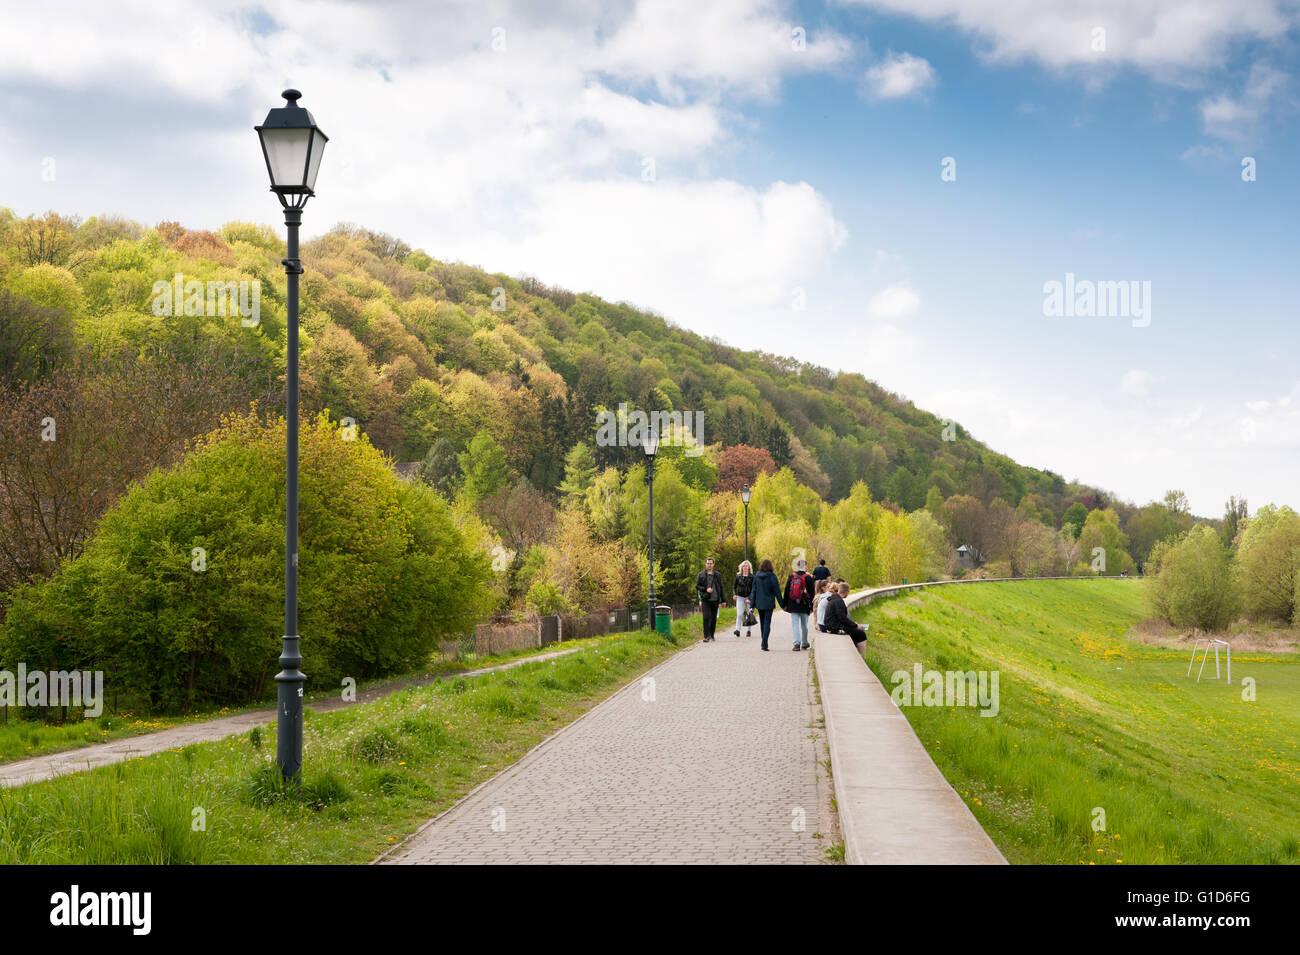 Walking on boulevards in Kazimierz Dolny by the Vistula River, Poland, Europe, promenade landscape in spring season... - Stock Image